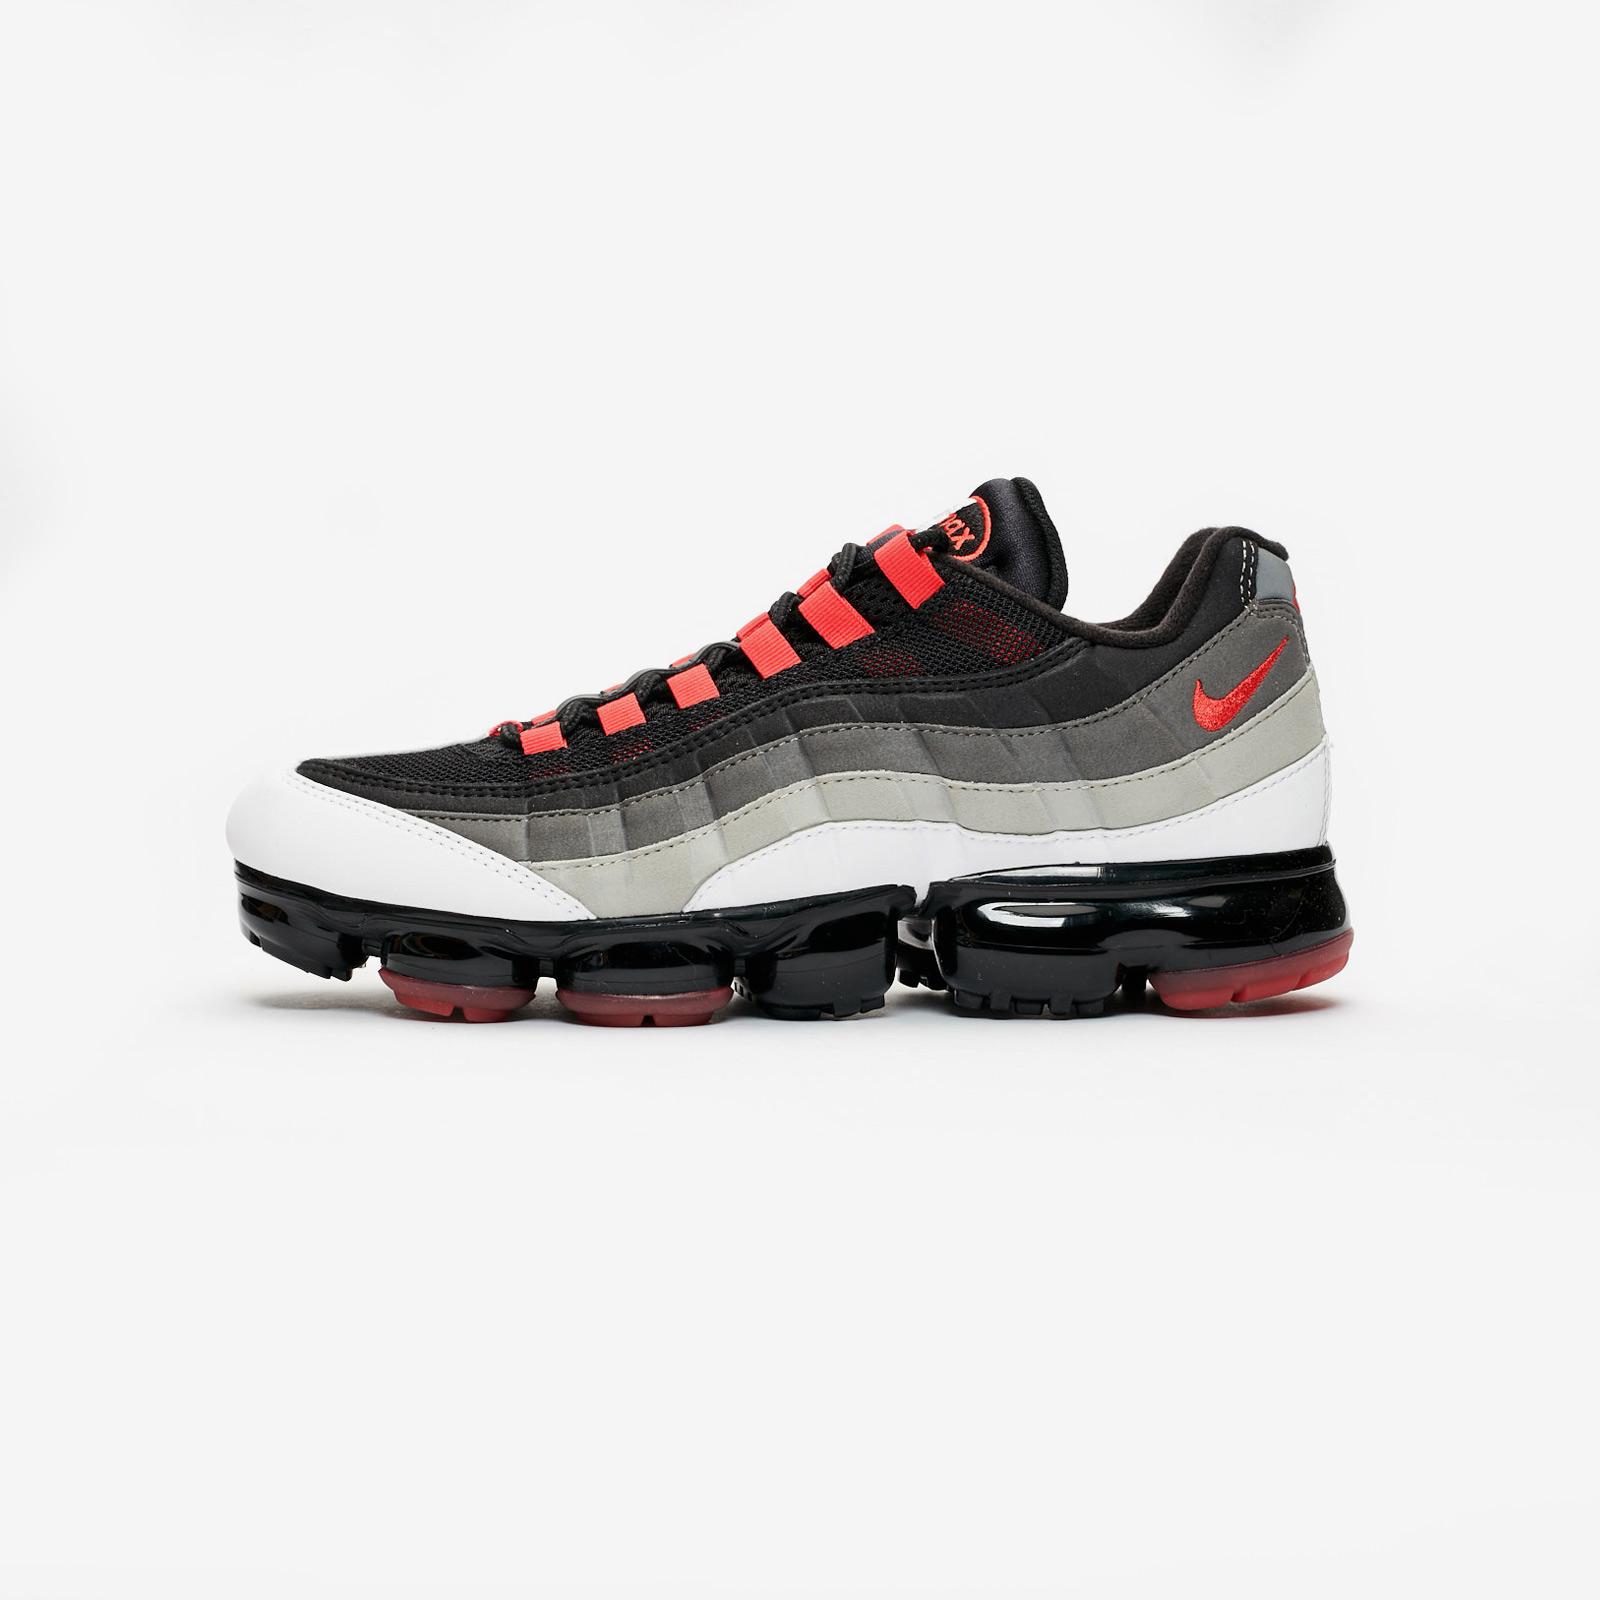 Nike Air Vapormax 95 - Aj7292-101 - SNS | sneakers & streetwear ...